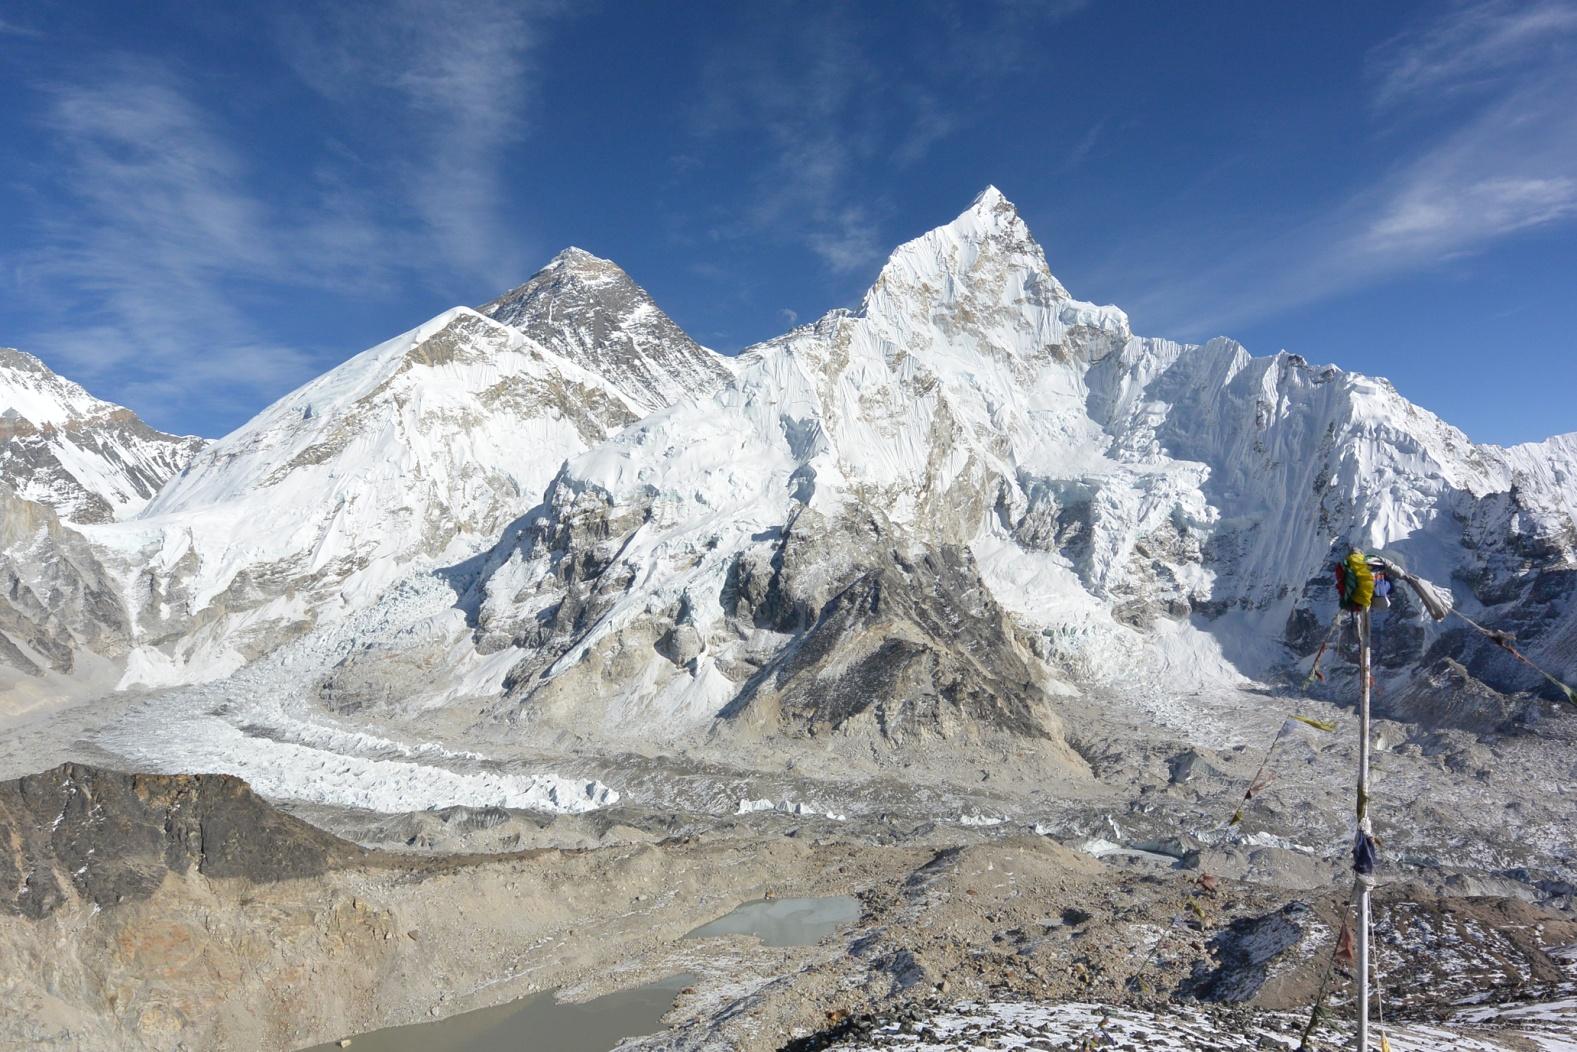 More-about-Everest-Trekking-Adventure